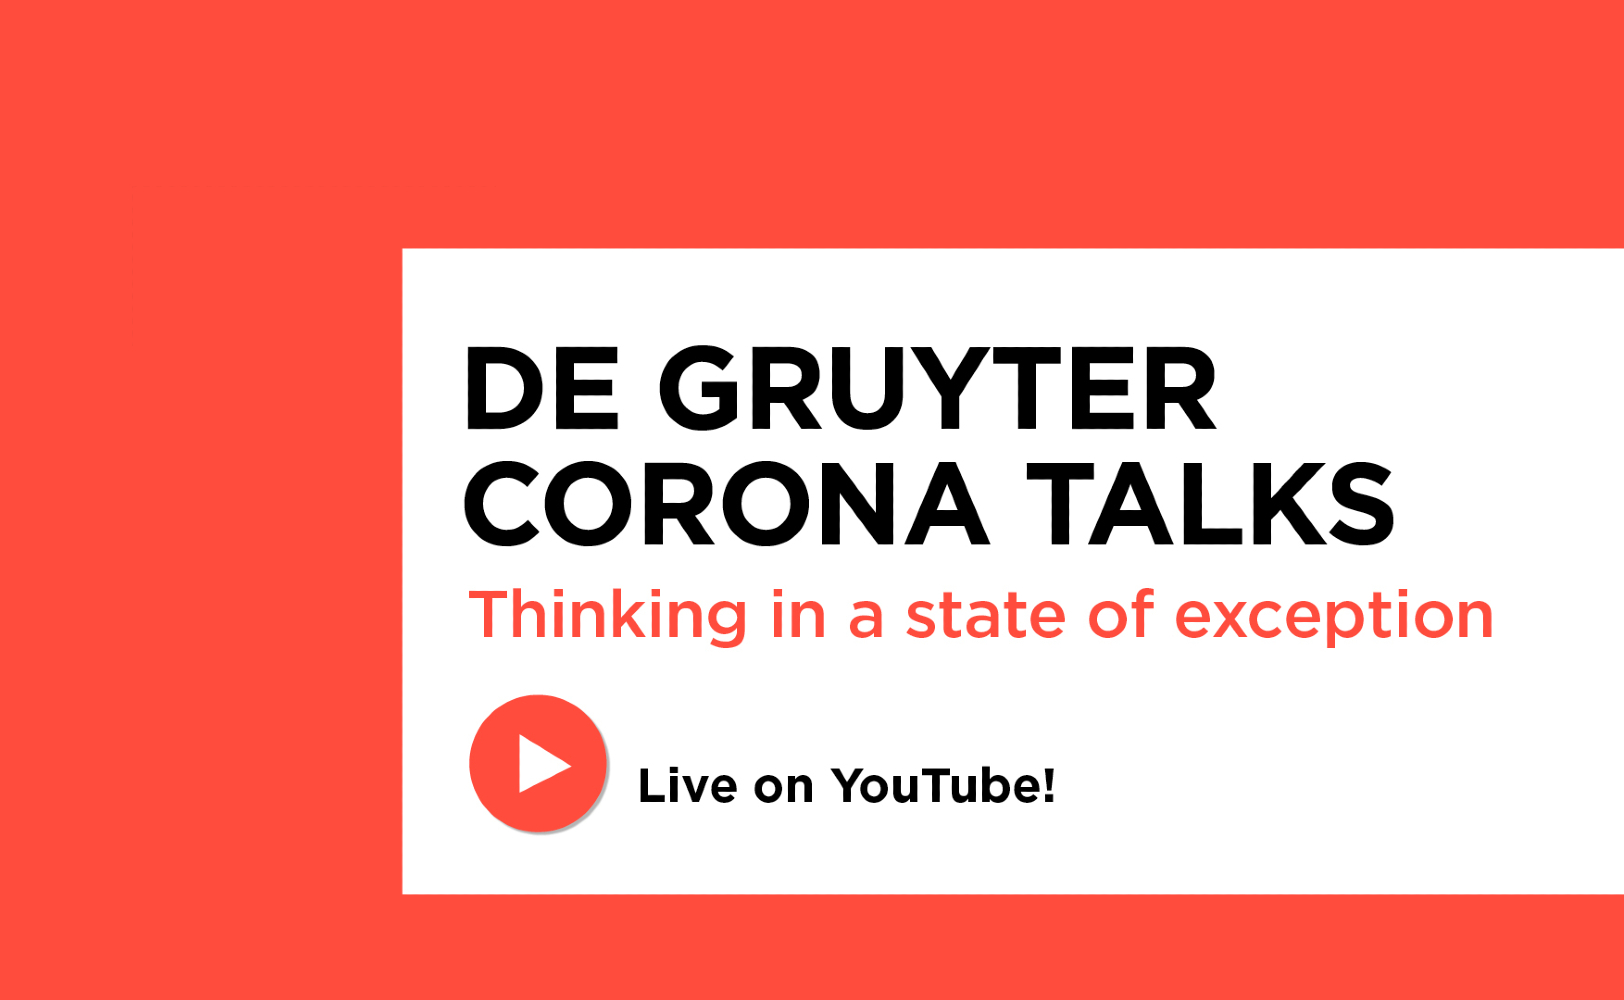 De Gruyter Corona Talks